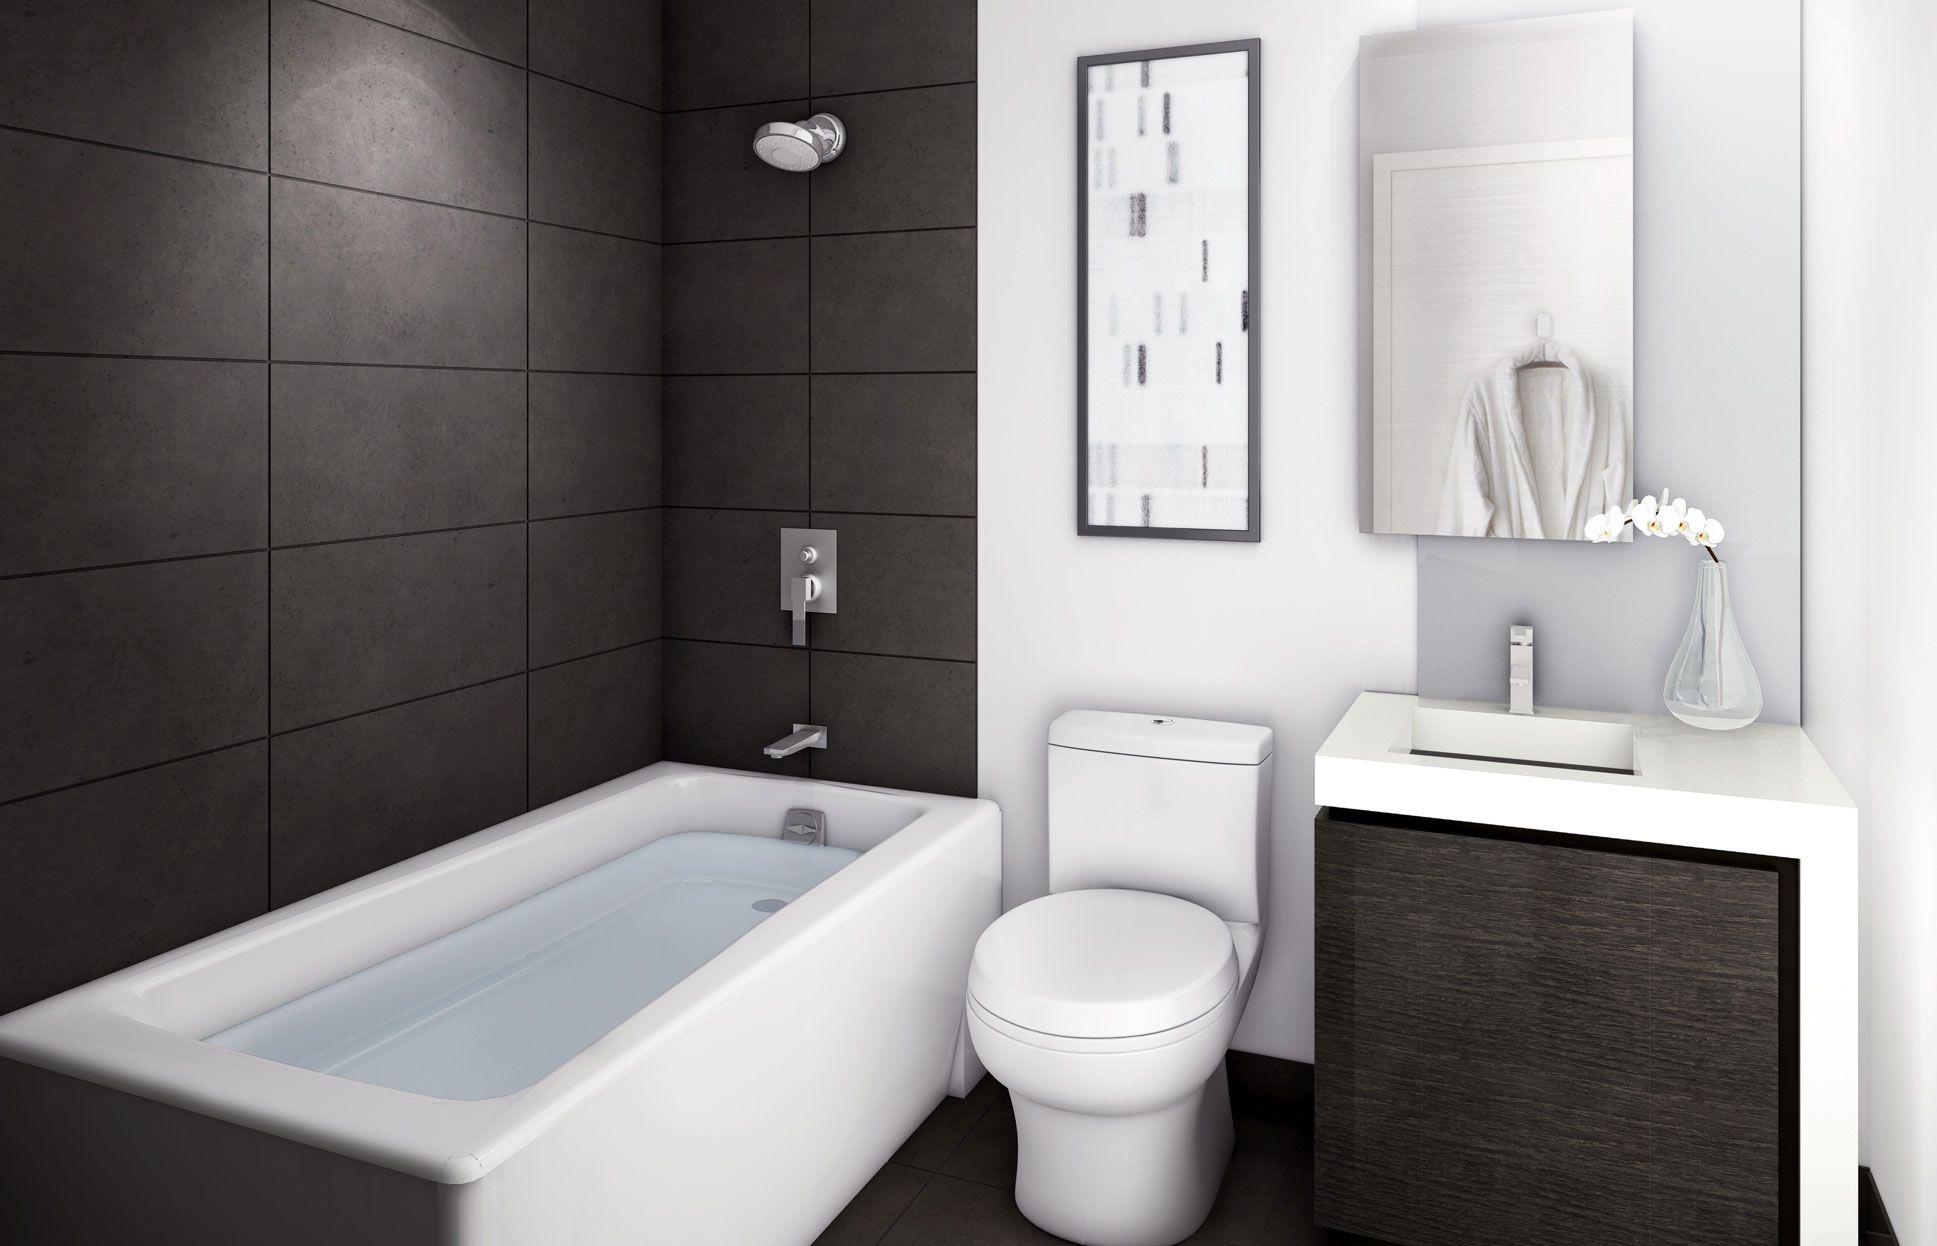 Stunning Small Bathroom Images 2012   bathroom   Pinterest   Small ...